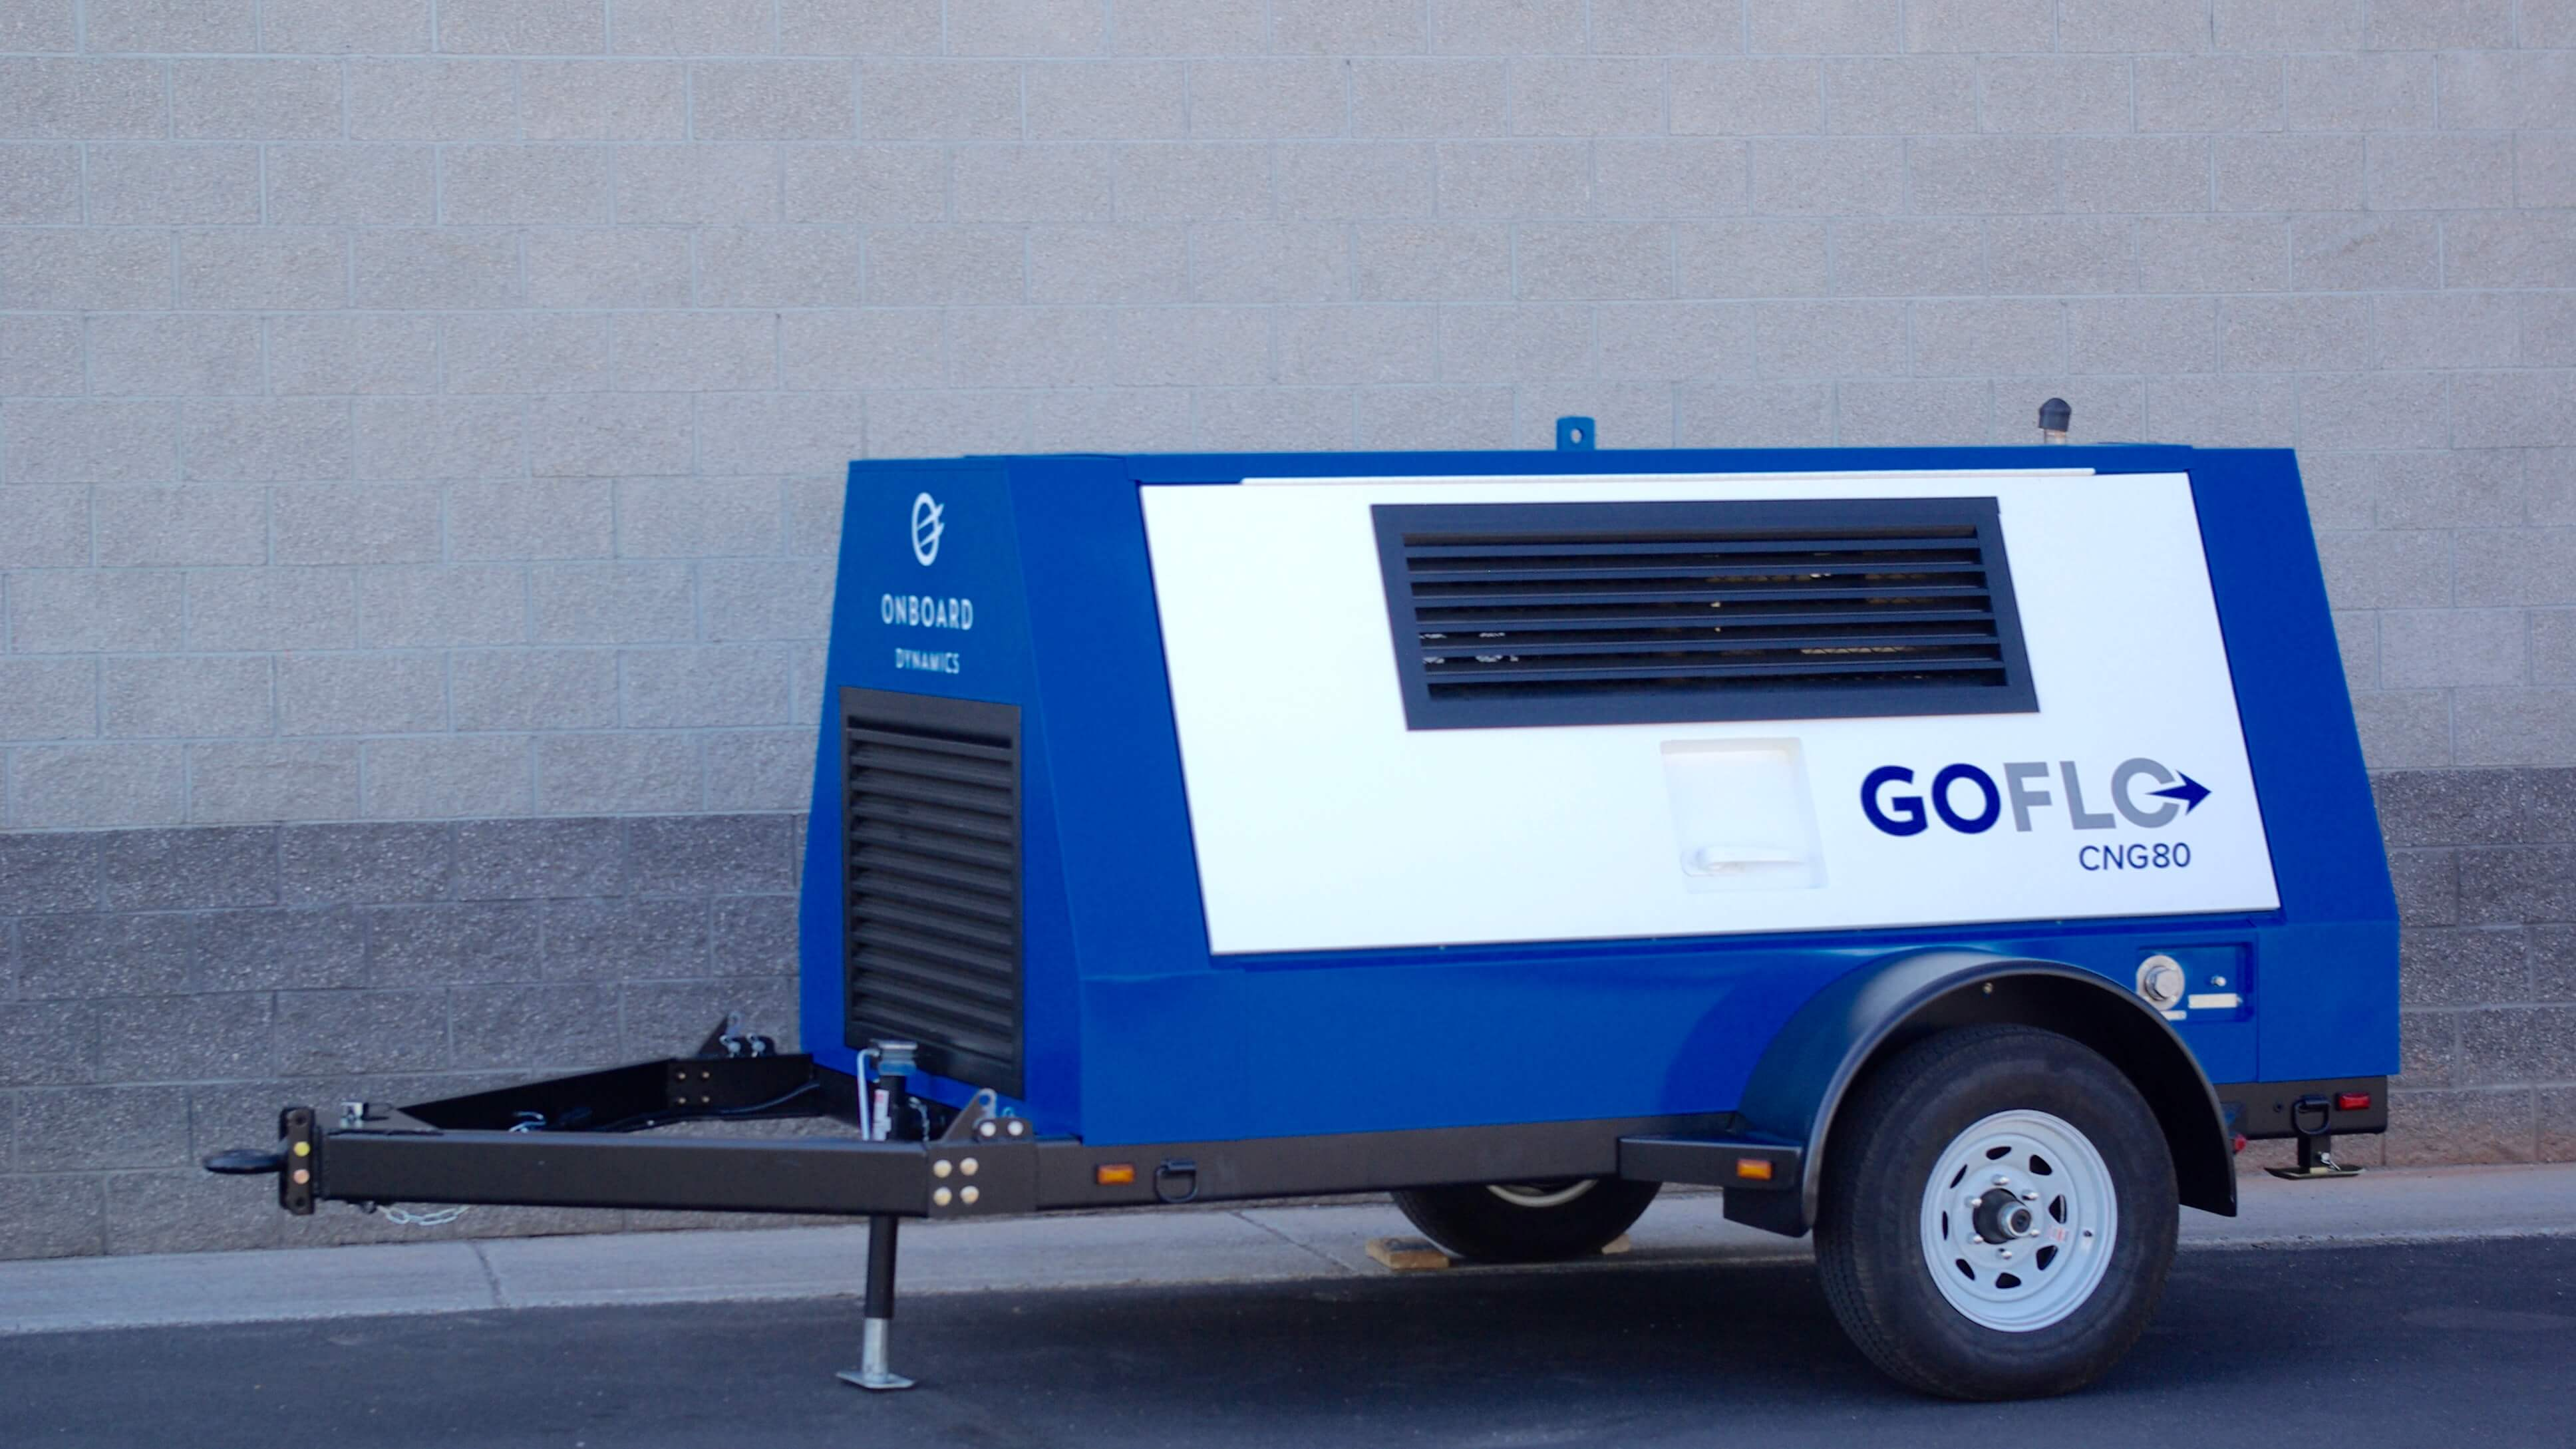 GoFlo CNG-80